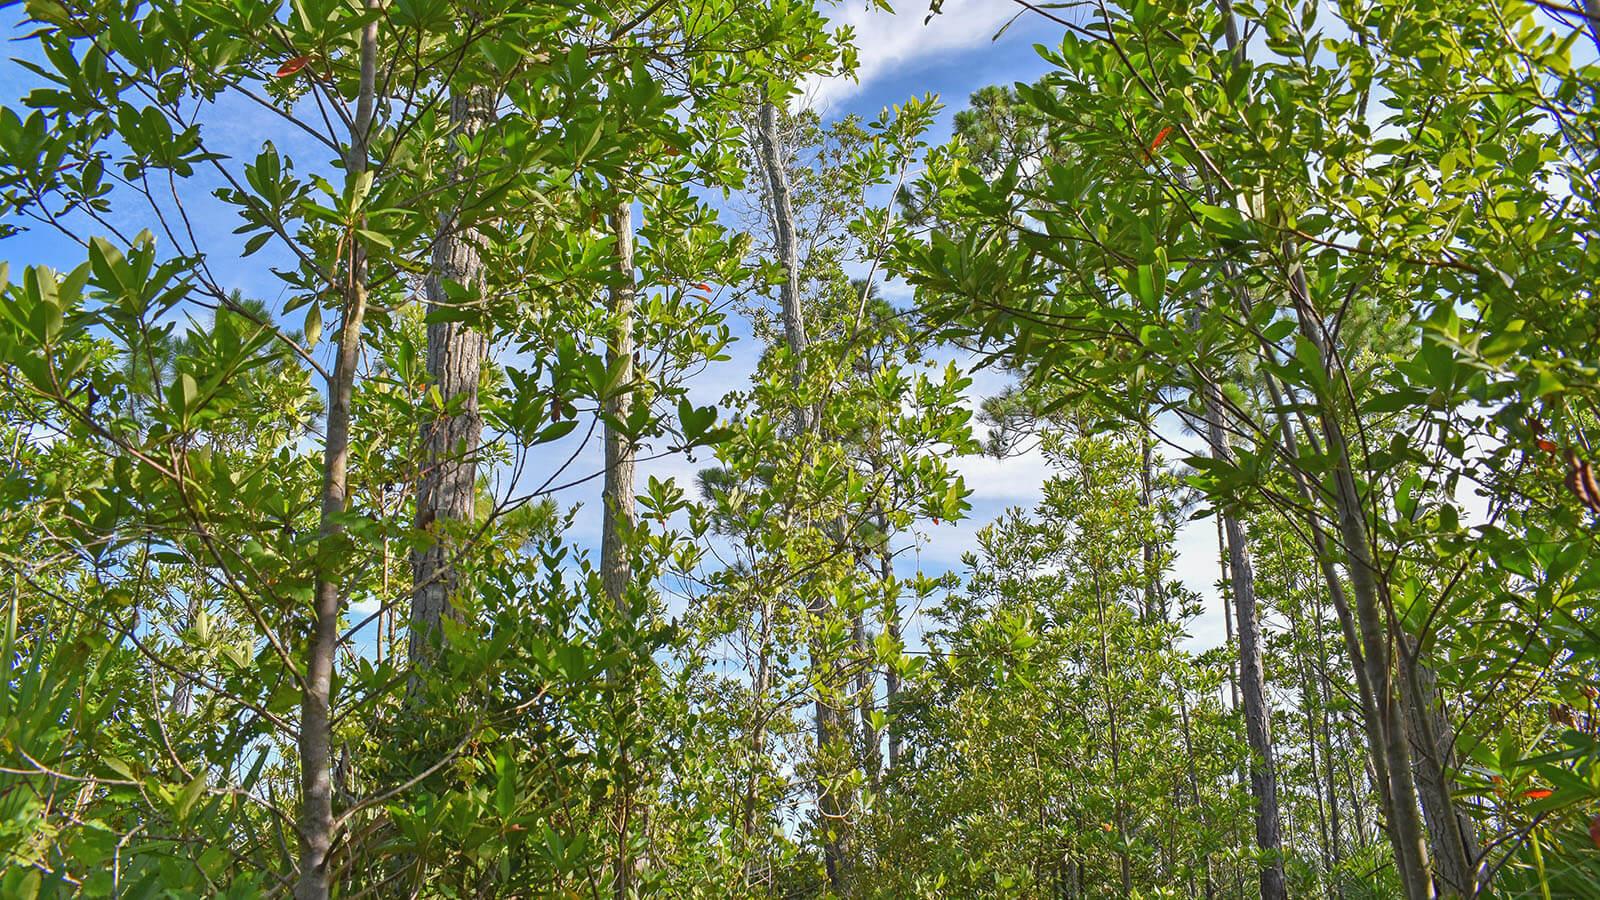 Loblolly bay trees against sky